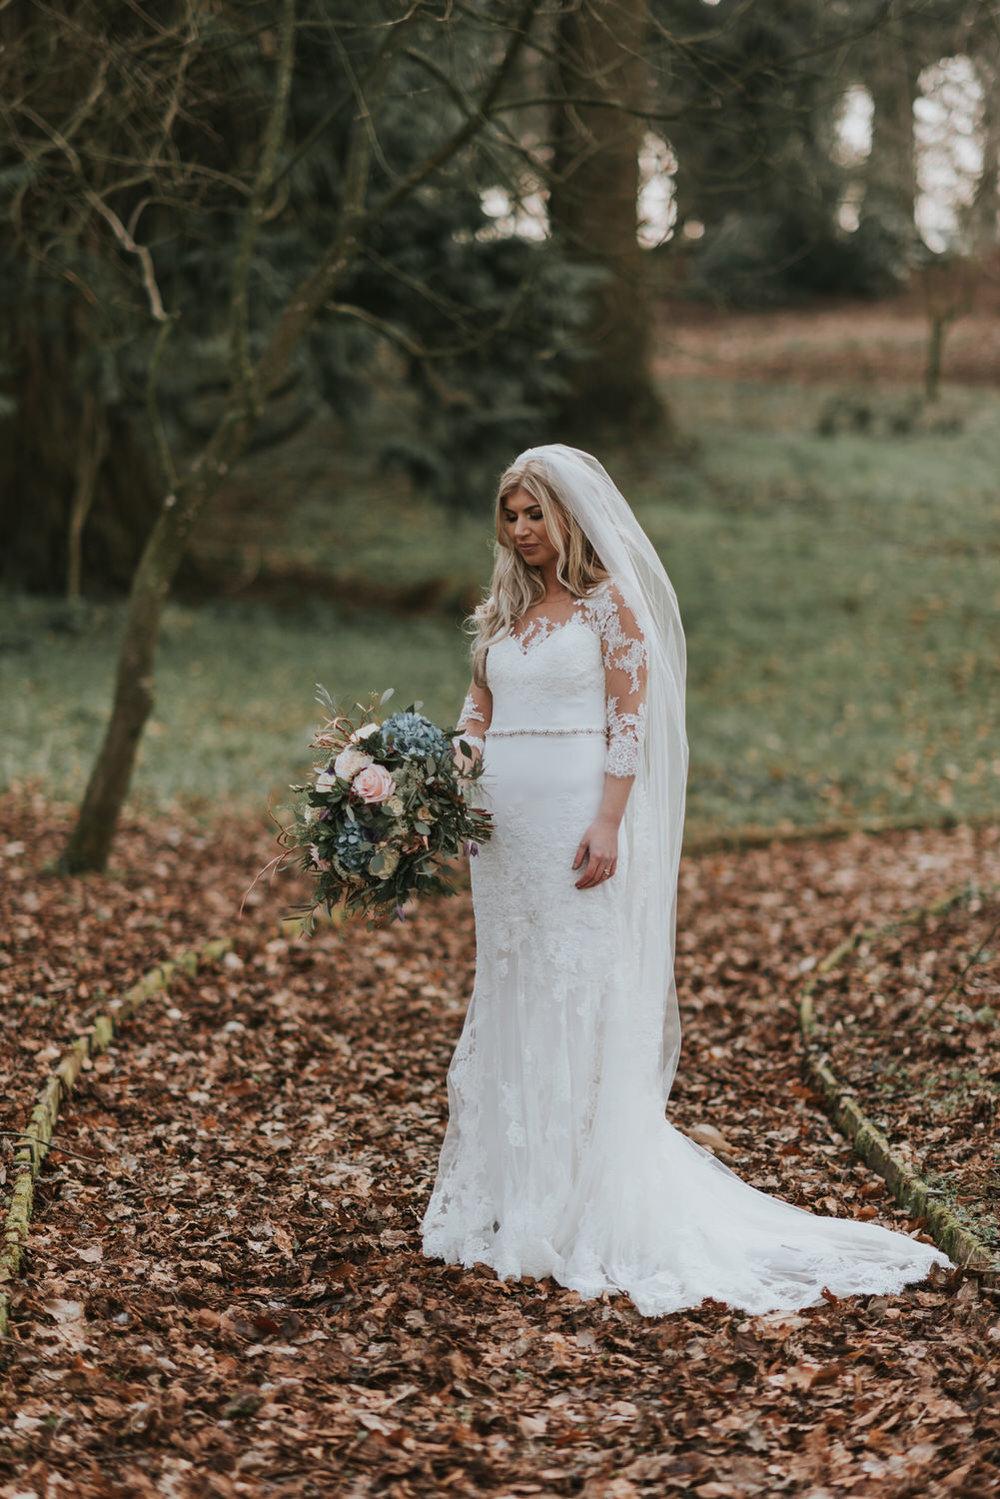 Wedding Photos at Tullylagan 83